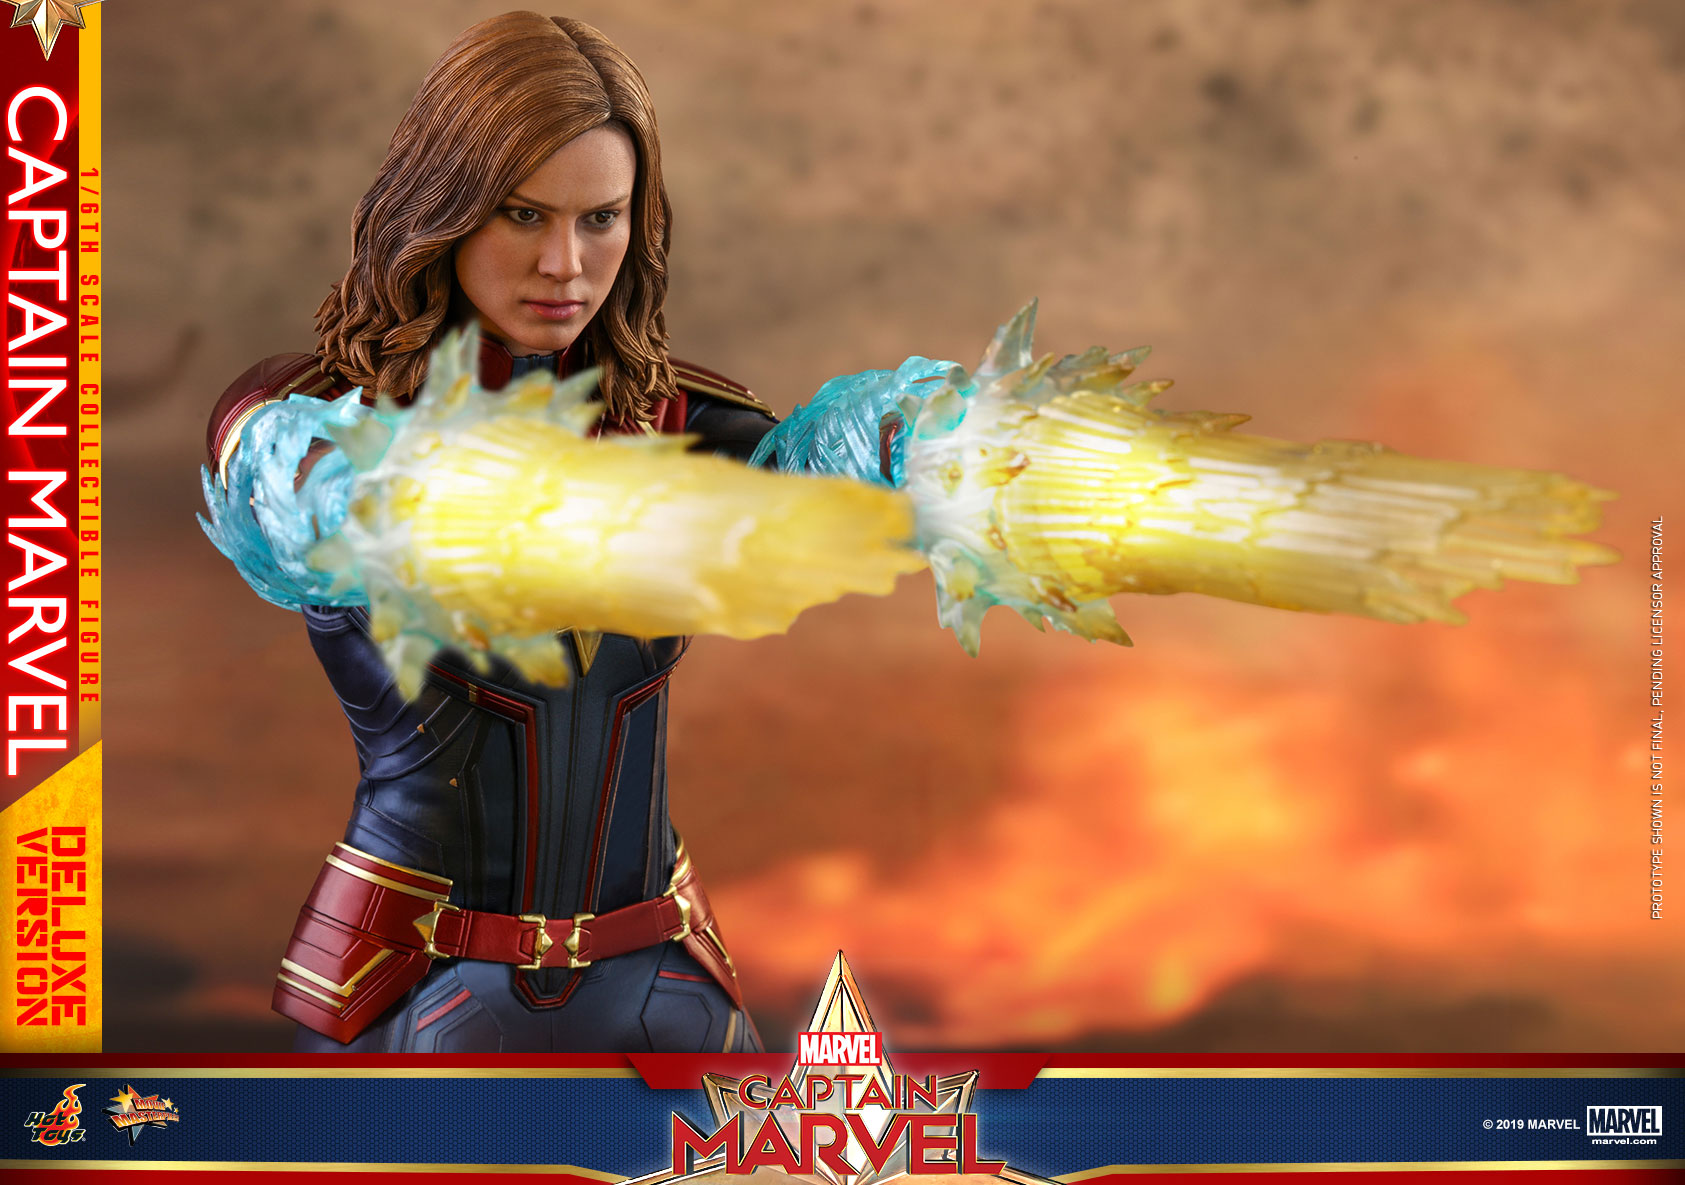 Hot-Toys---Captain-Marvel---Captain-Marvel-collectible-figure-(Deluxe)_PR20